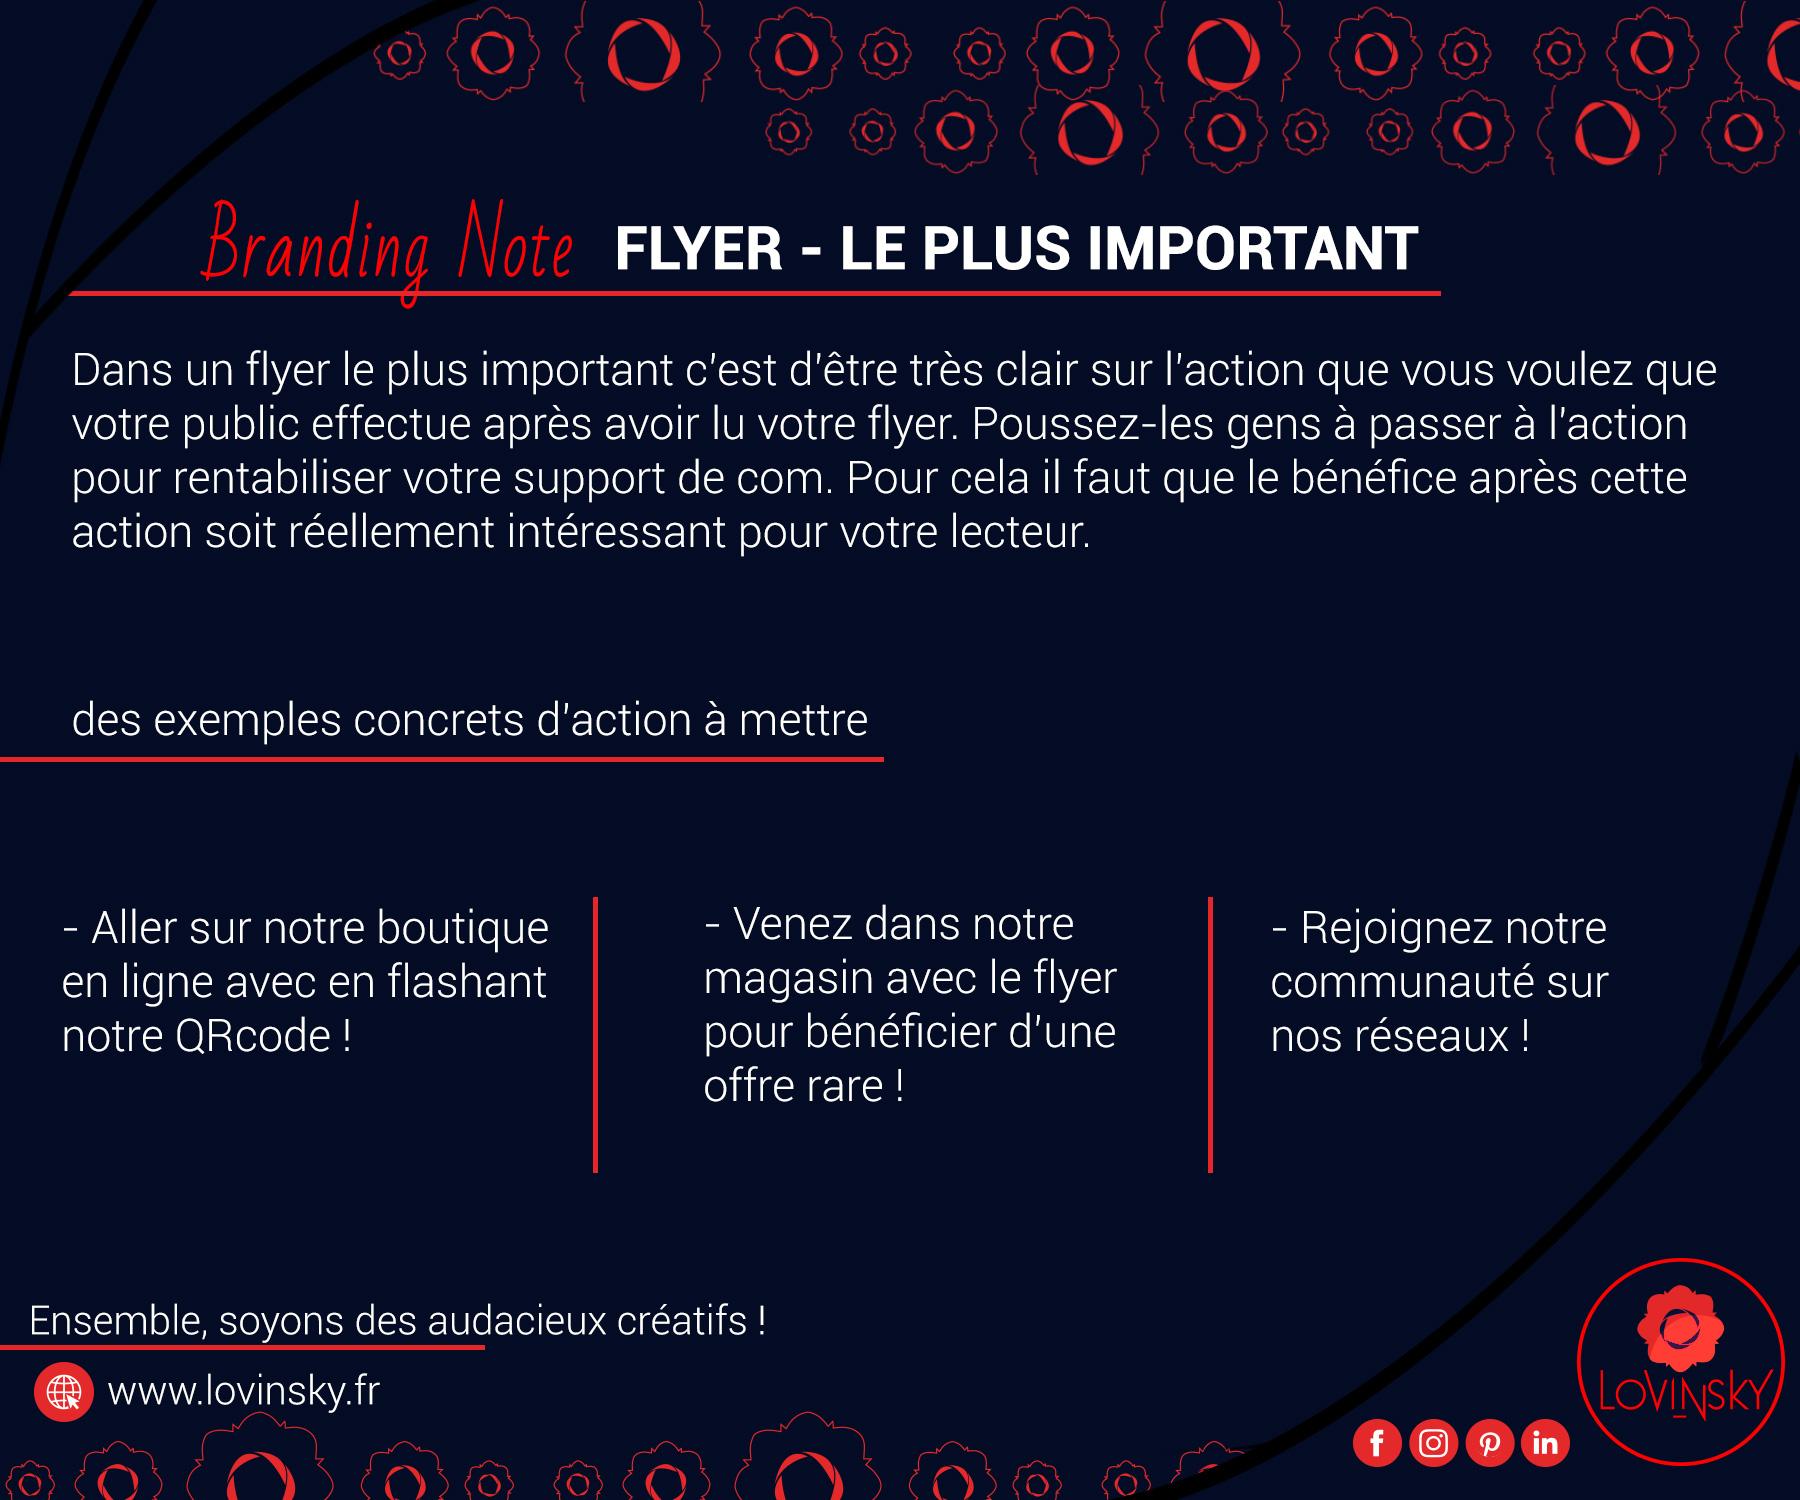 flyer-le-plus-important-branding-note-lovinsky-graphiste-webdesigner-freelance-indépendant-nantes-44